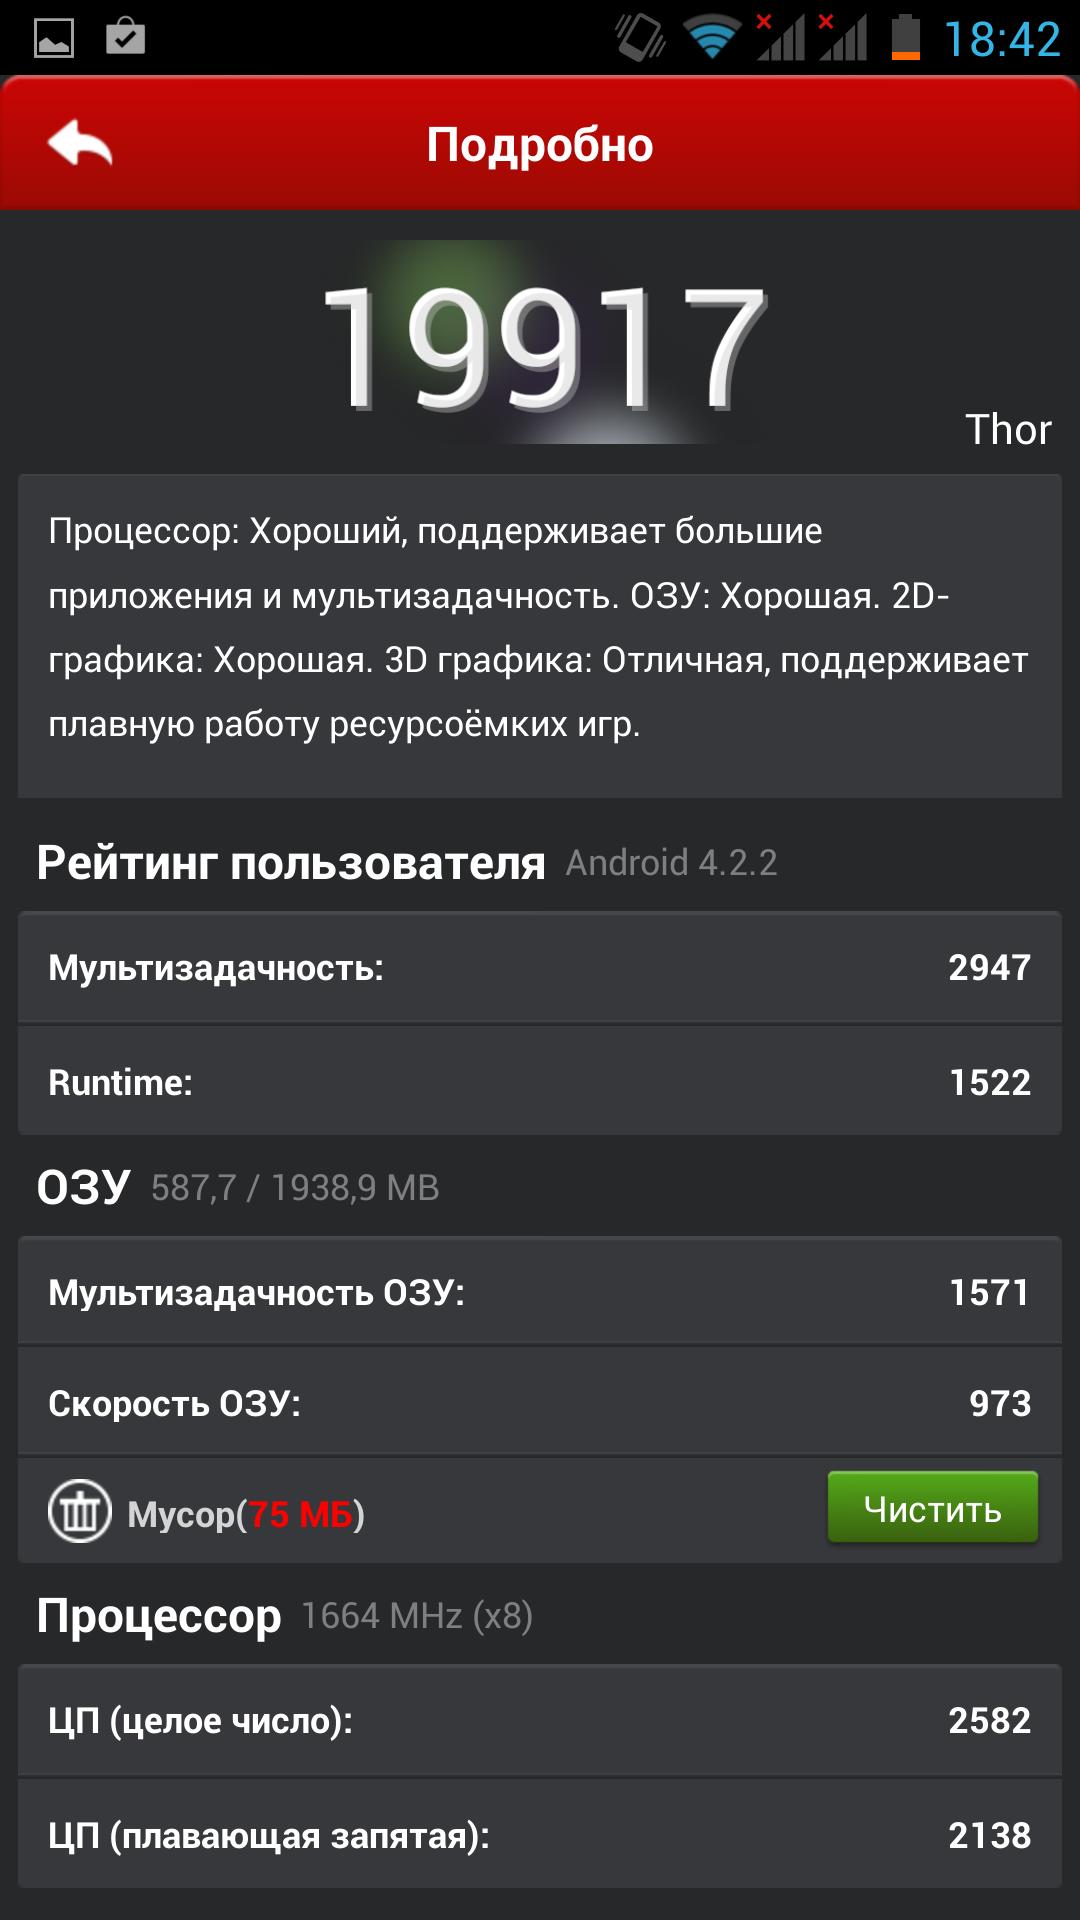 Screenshot_2014-07-10-18-42-14